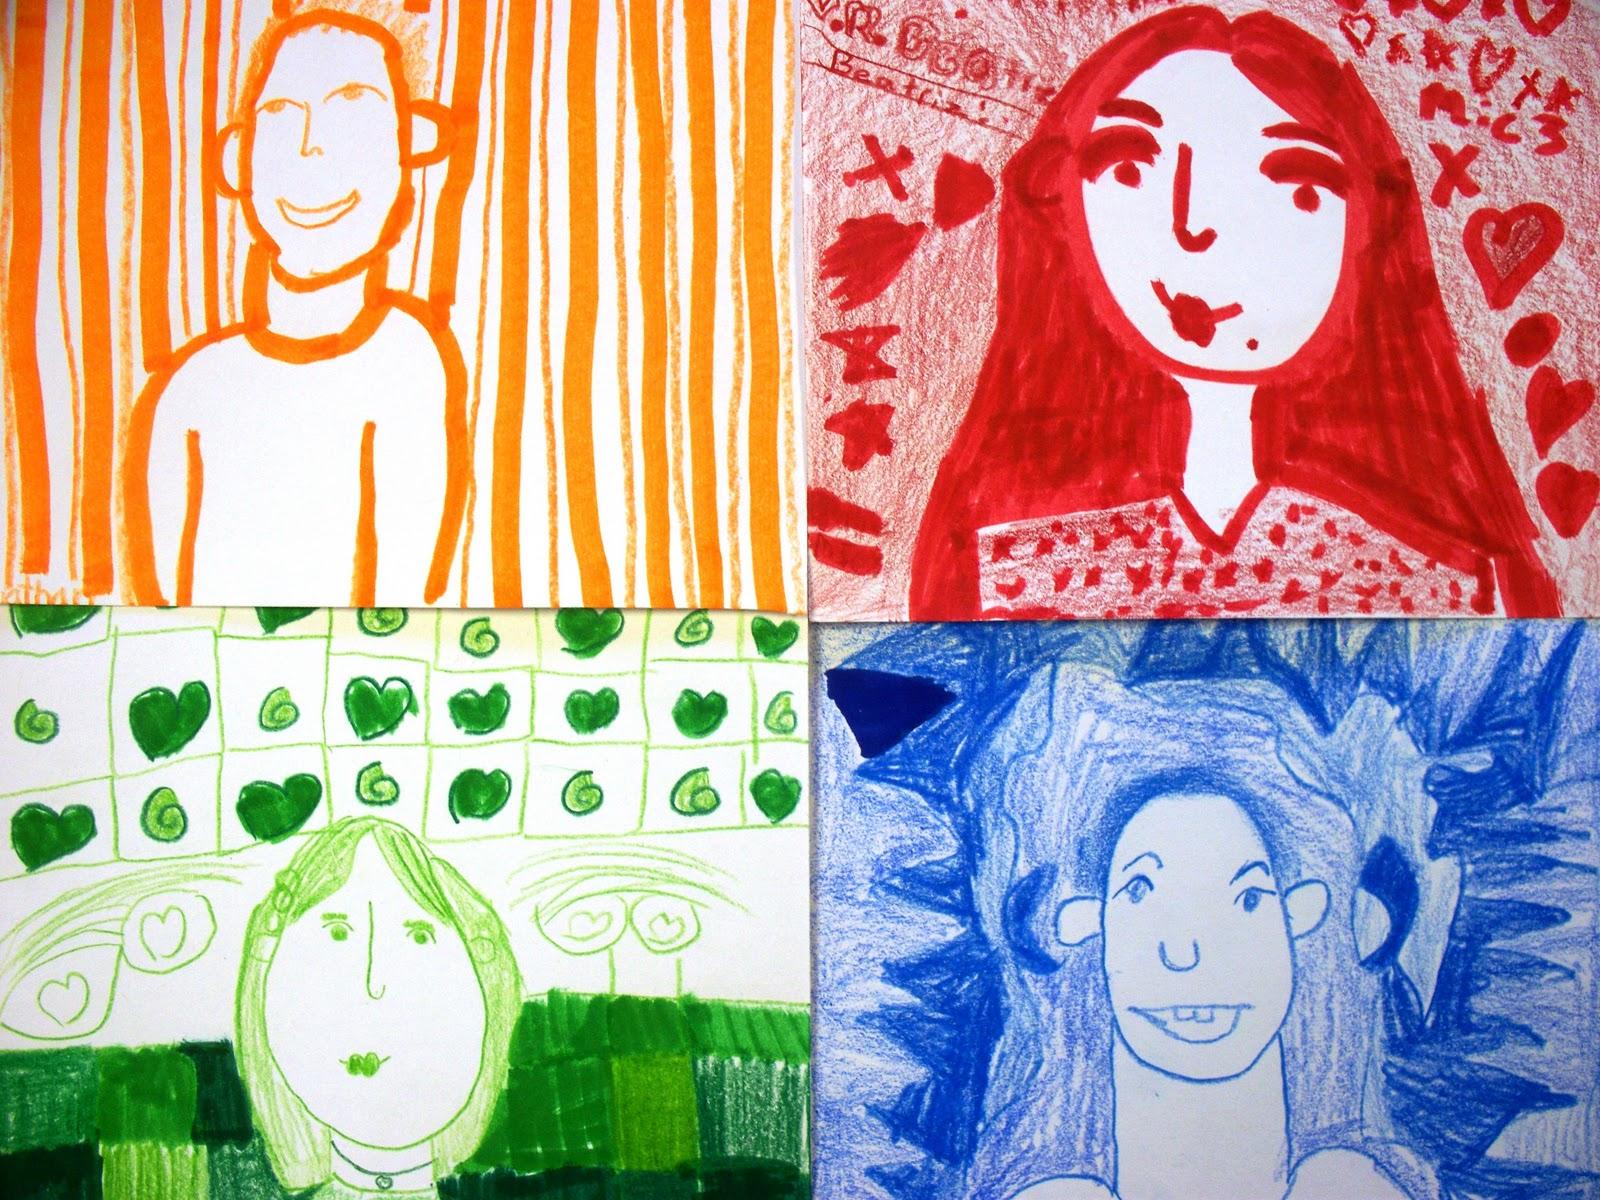 Creating Art Monochromatic Self Portraits